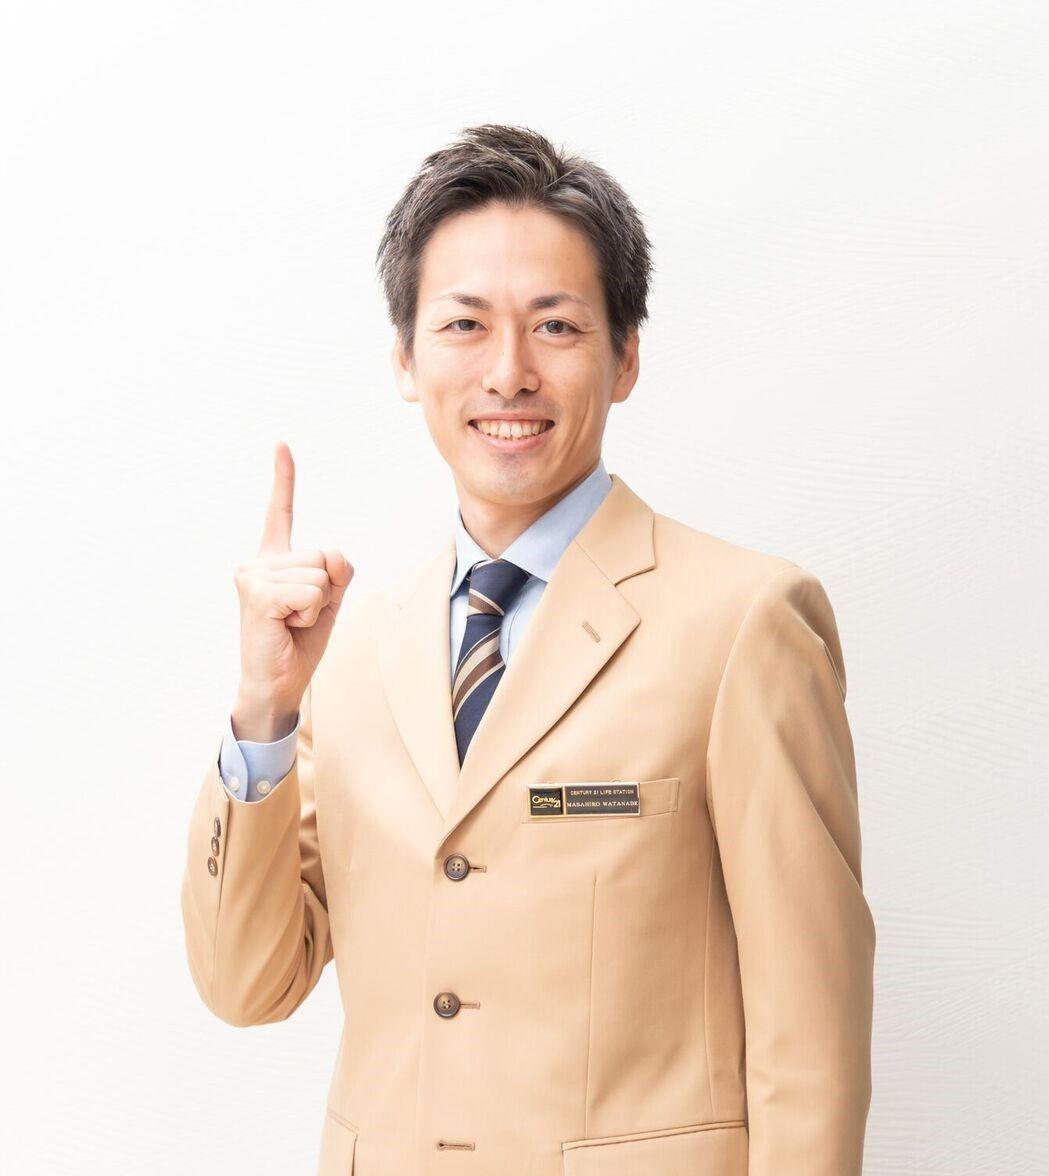 渡邉雅弘の画像